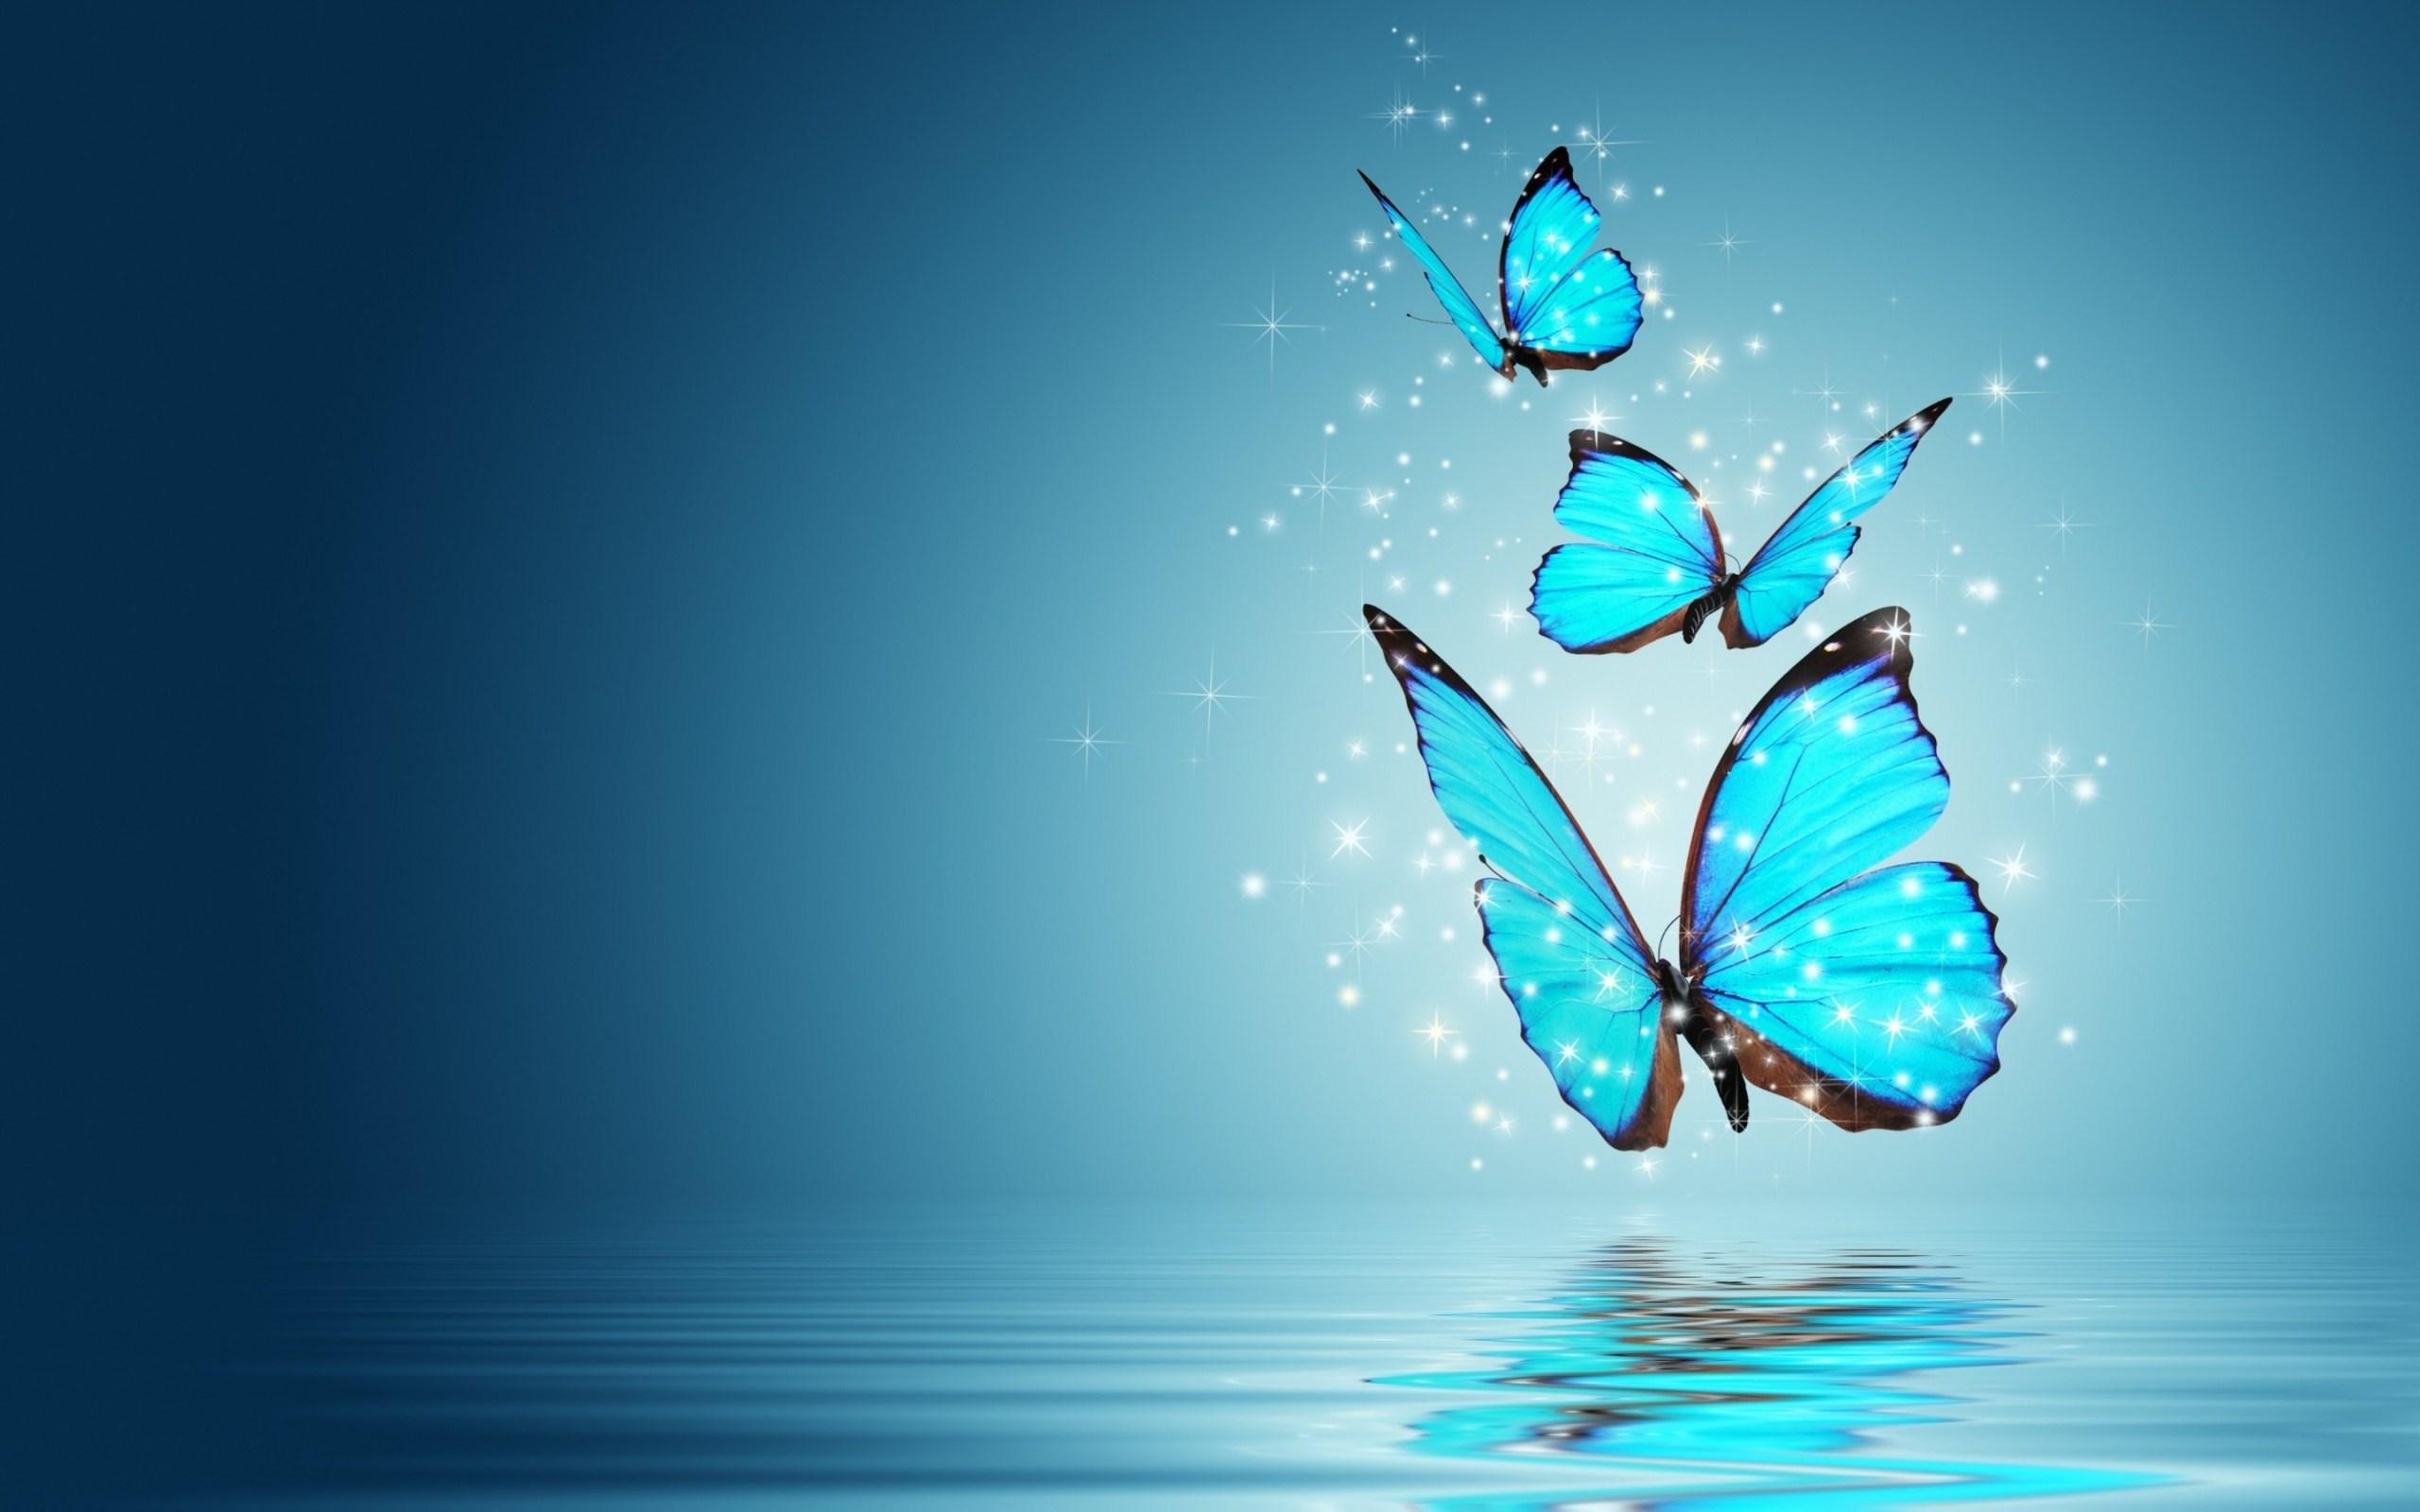 Butterflies sfondi per pc 2560x1600 id 487115 for Immagini farfalle per desktop